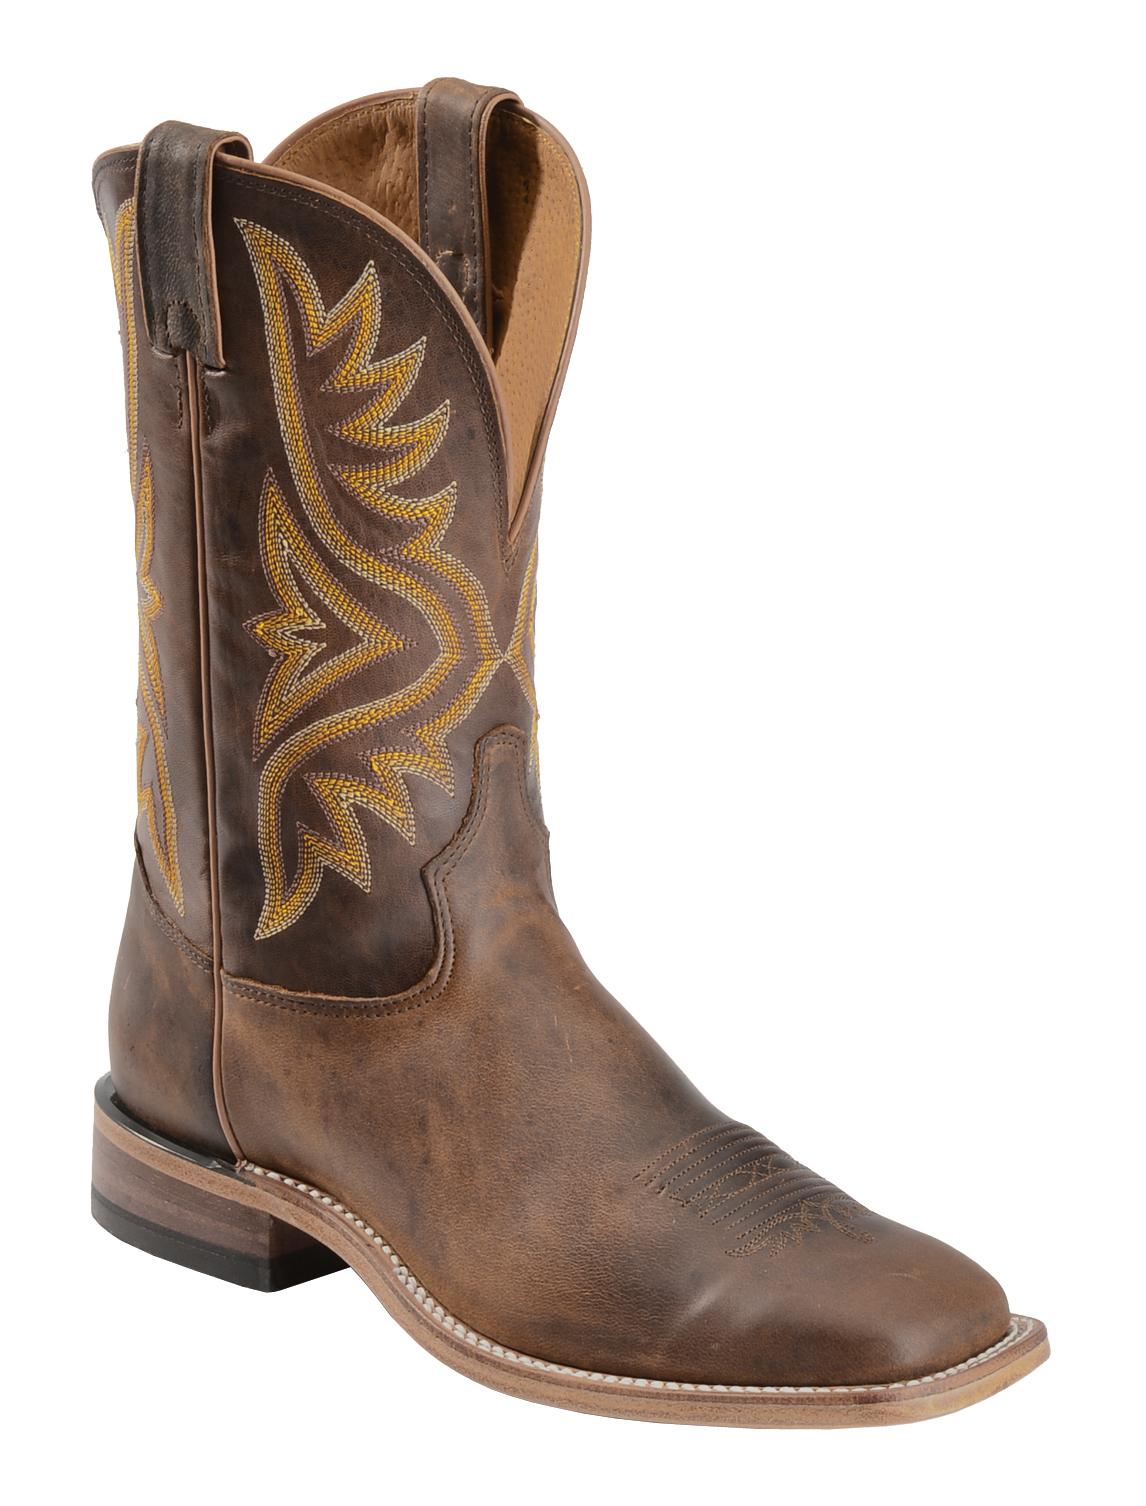 Tony Lama Tan Worn Goat Leather Americana Cowboy Boots - Square ...